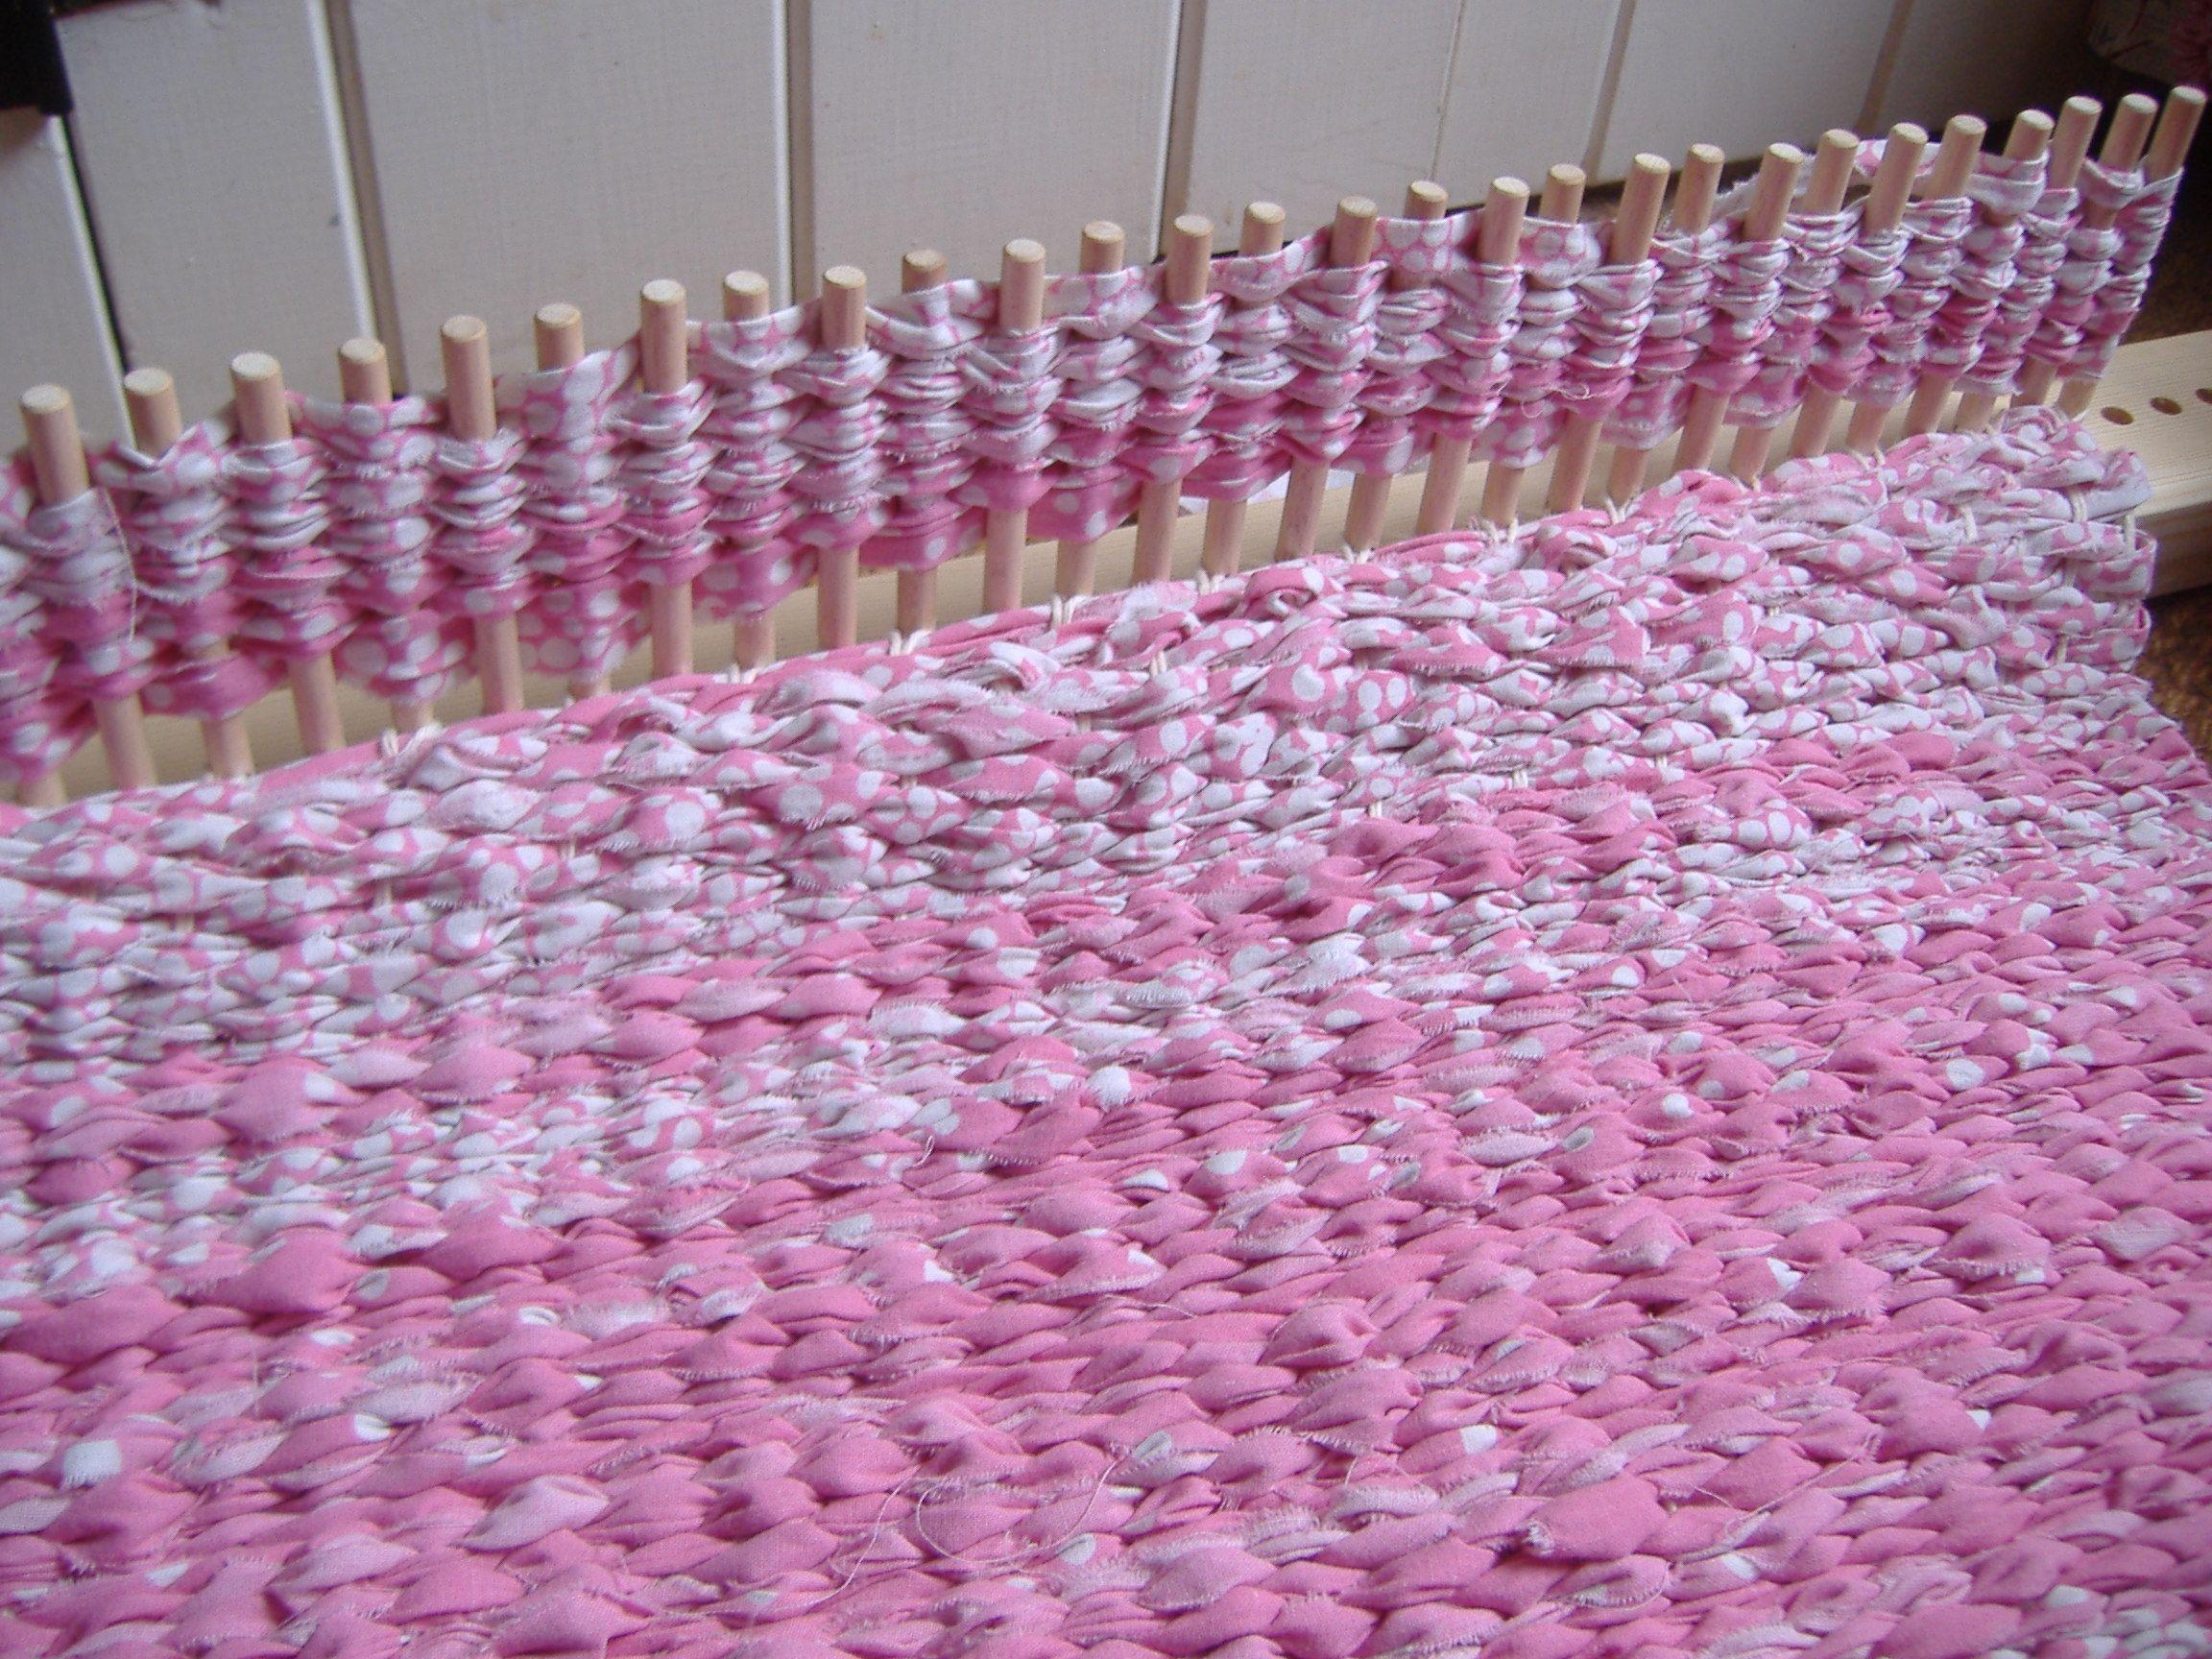 Peg Loom Rug Work In Progress